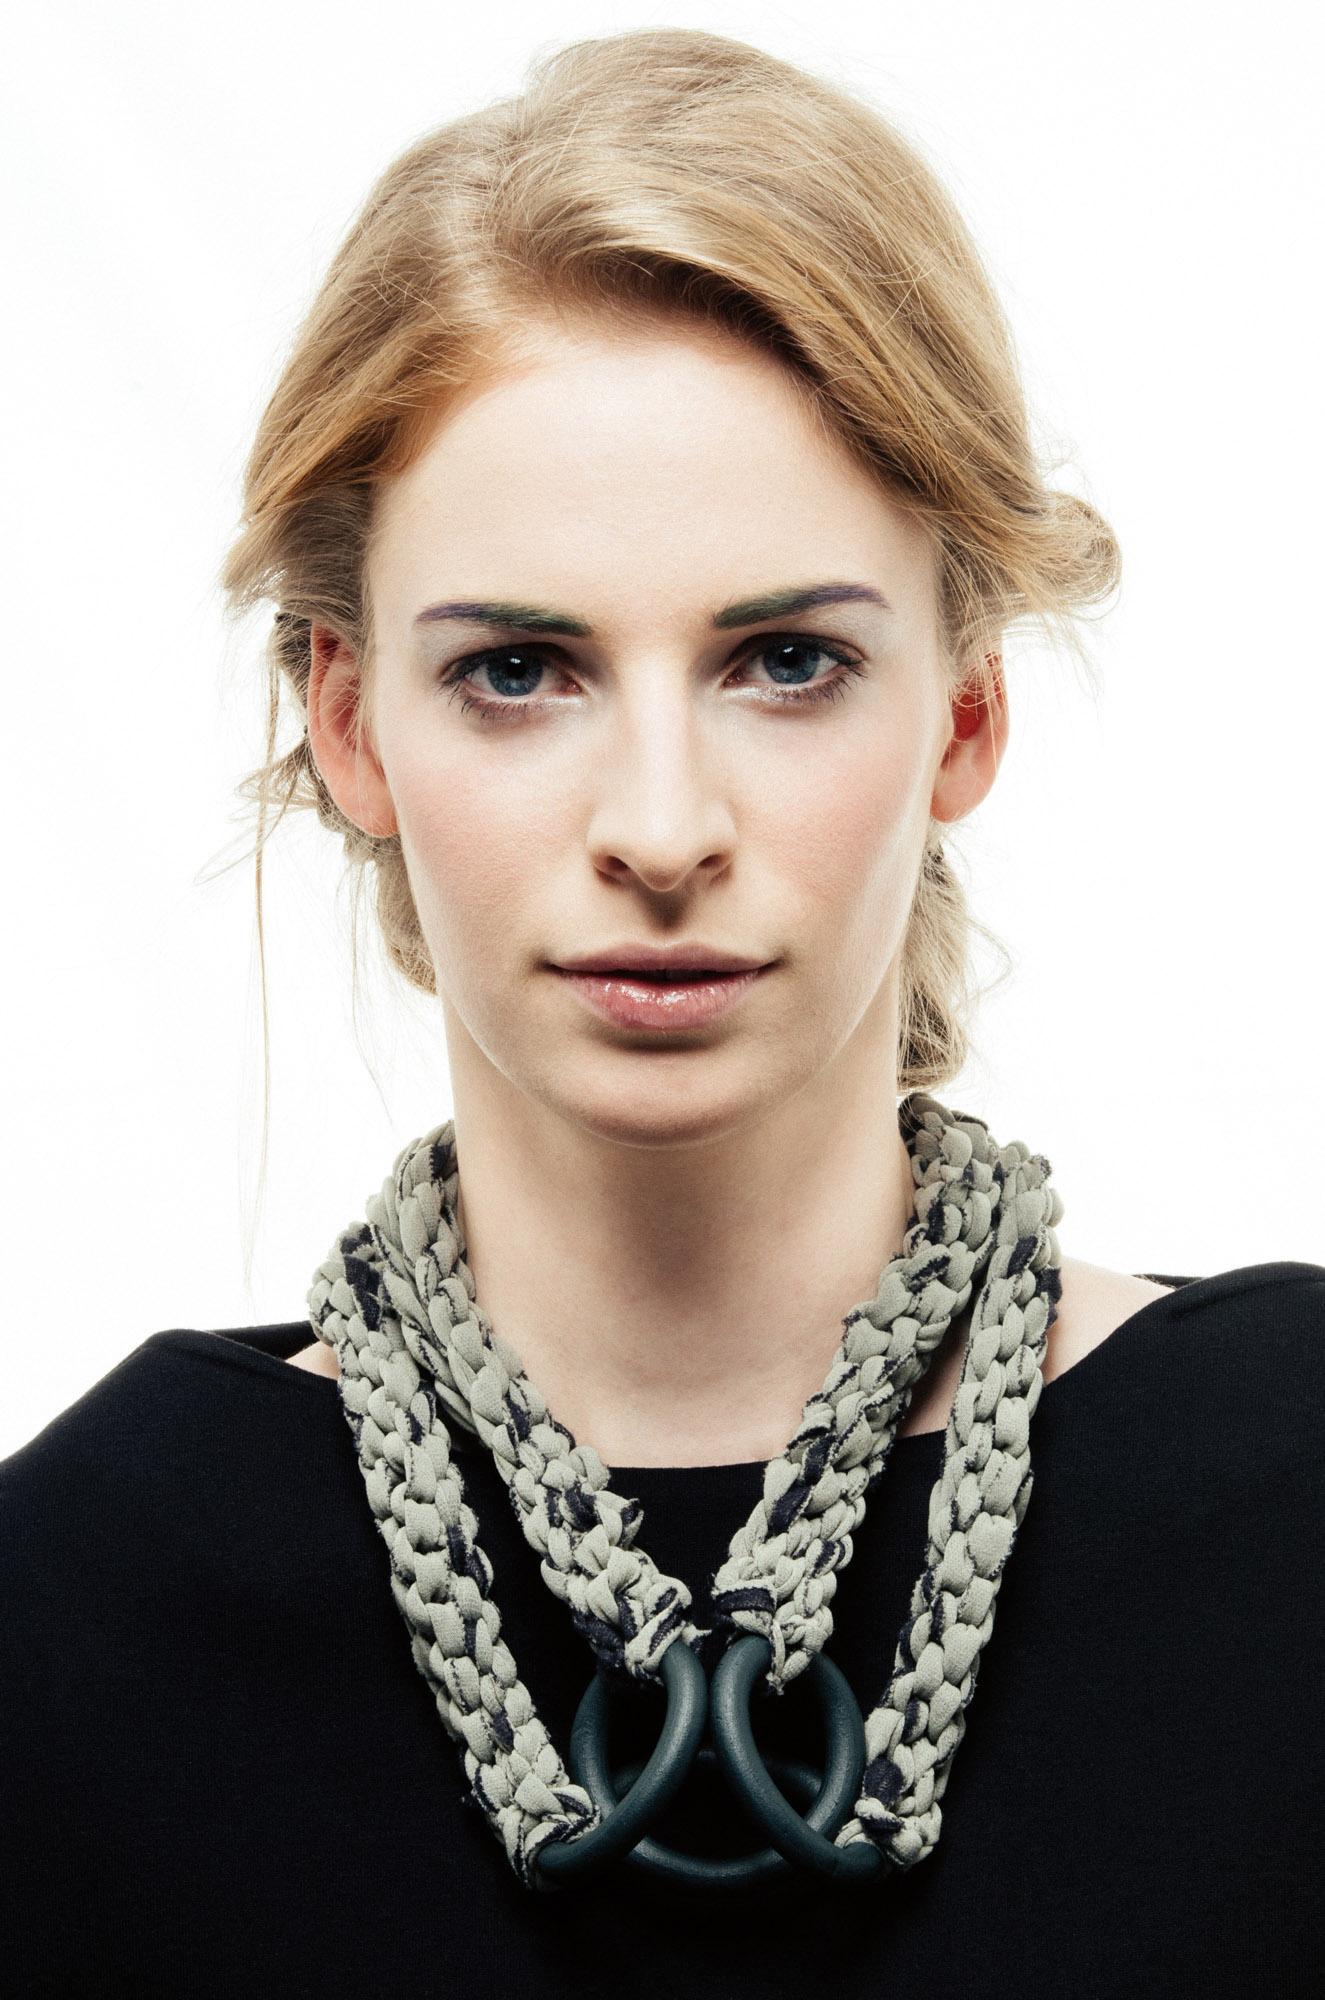 Bocco necklace by Anna Borshi 06.jpg